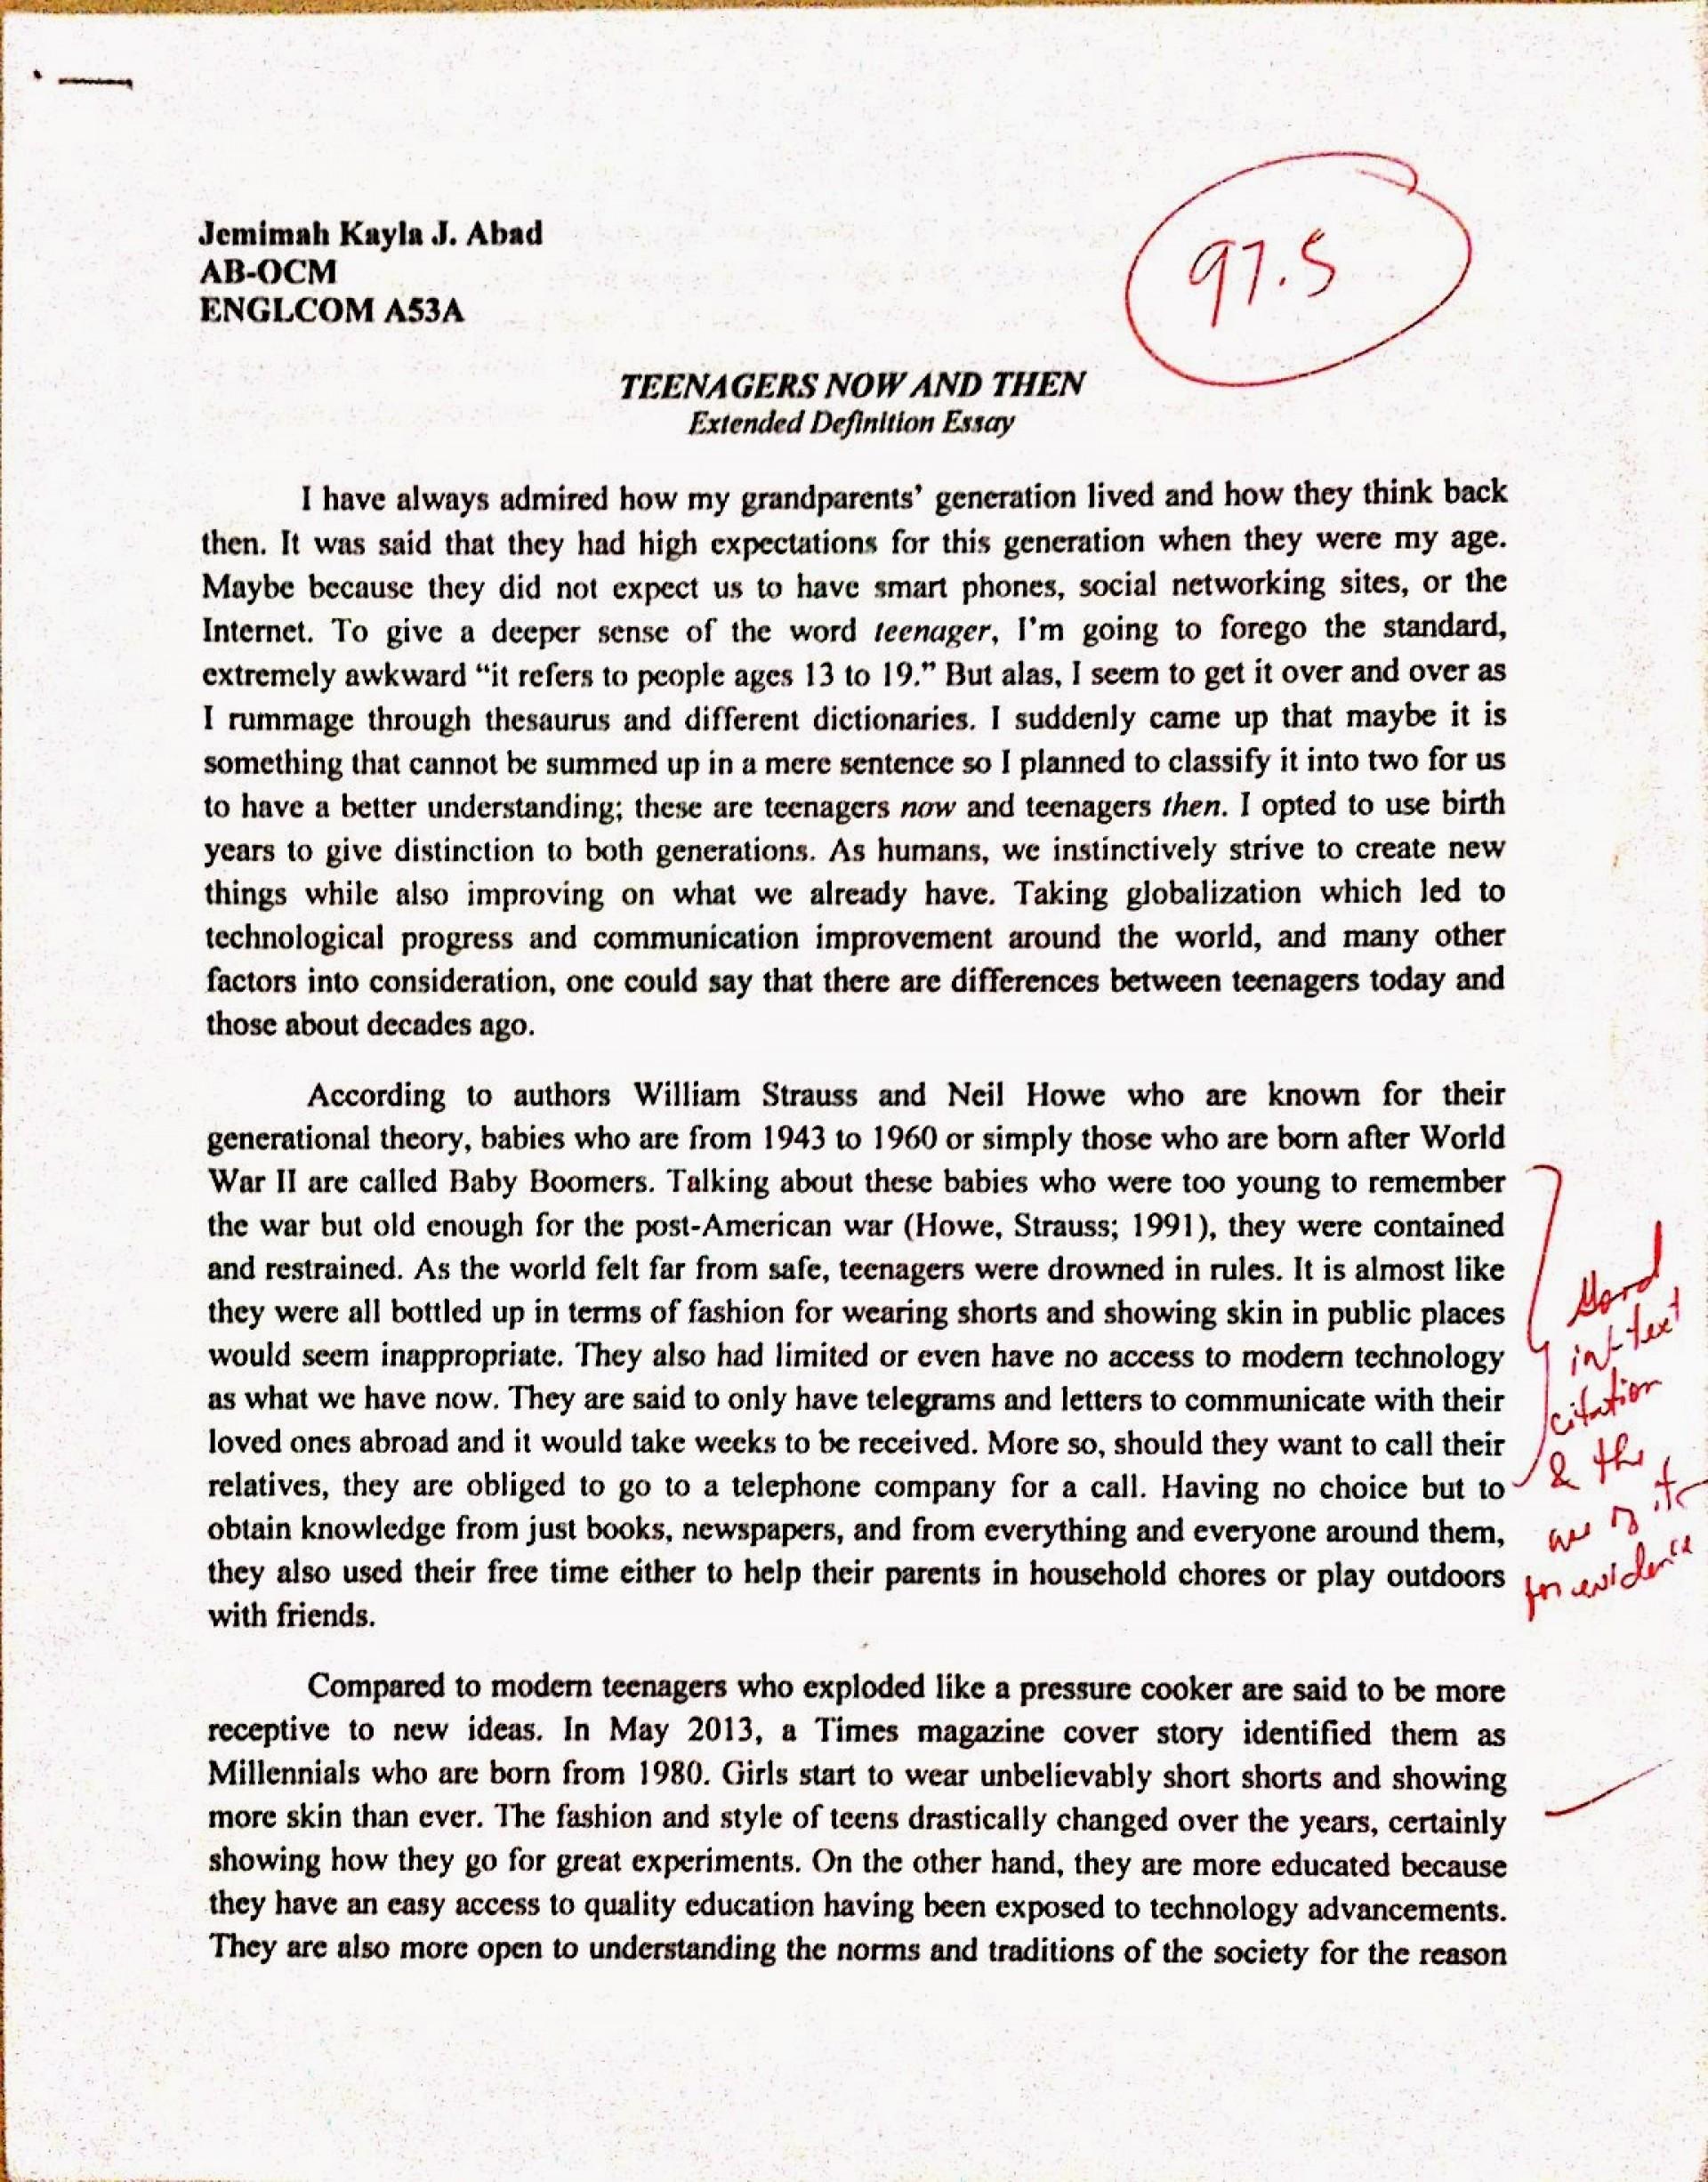 005 Newdoc2 1 Definition Essay Topics Striking For High School Creative 1920